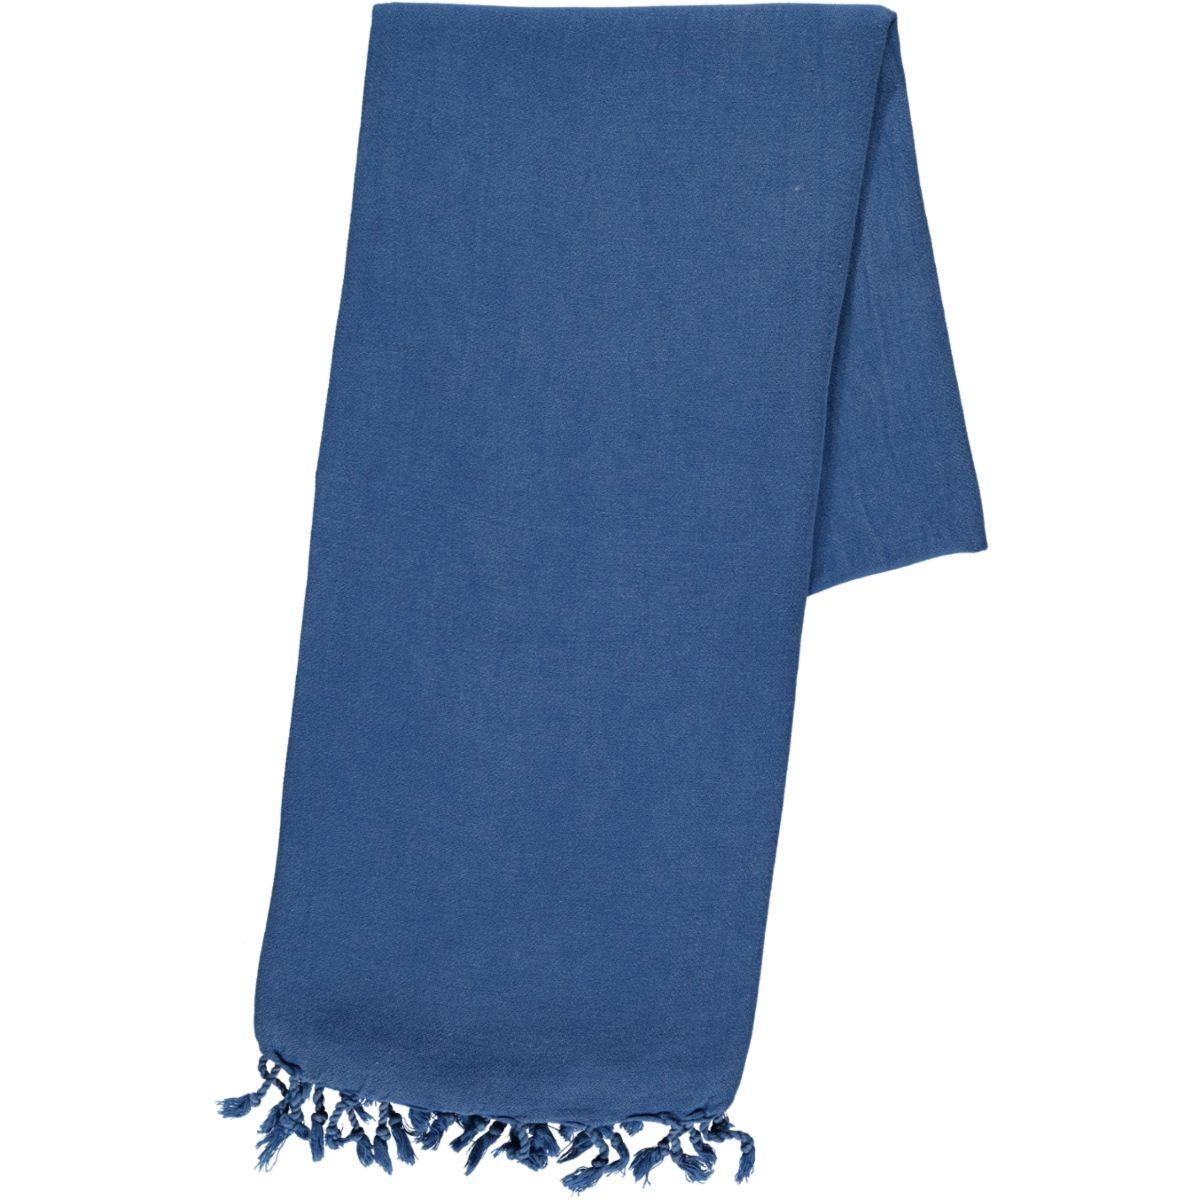 Peştemal Taş Sultan - Royal Mavi